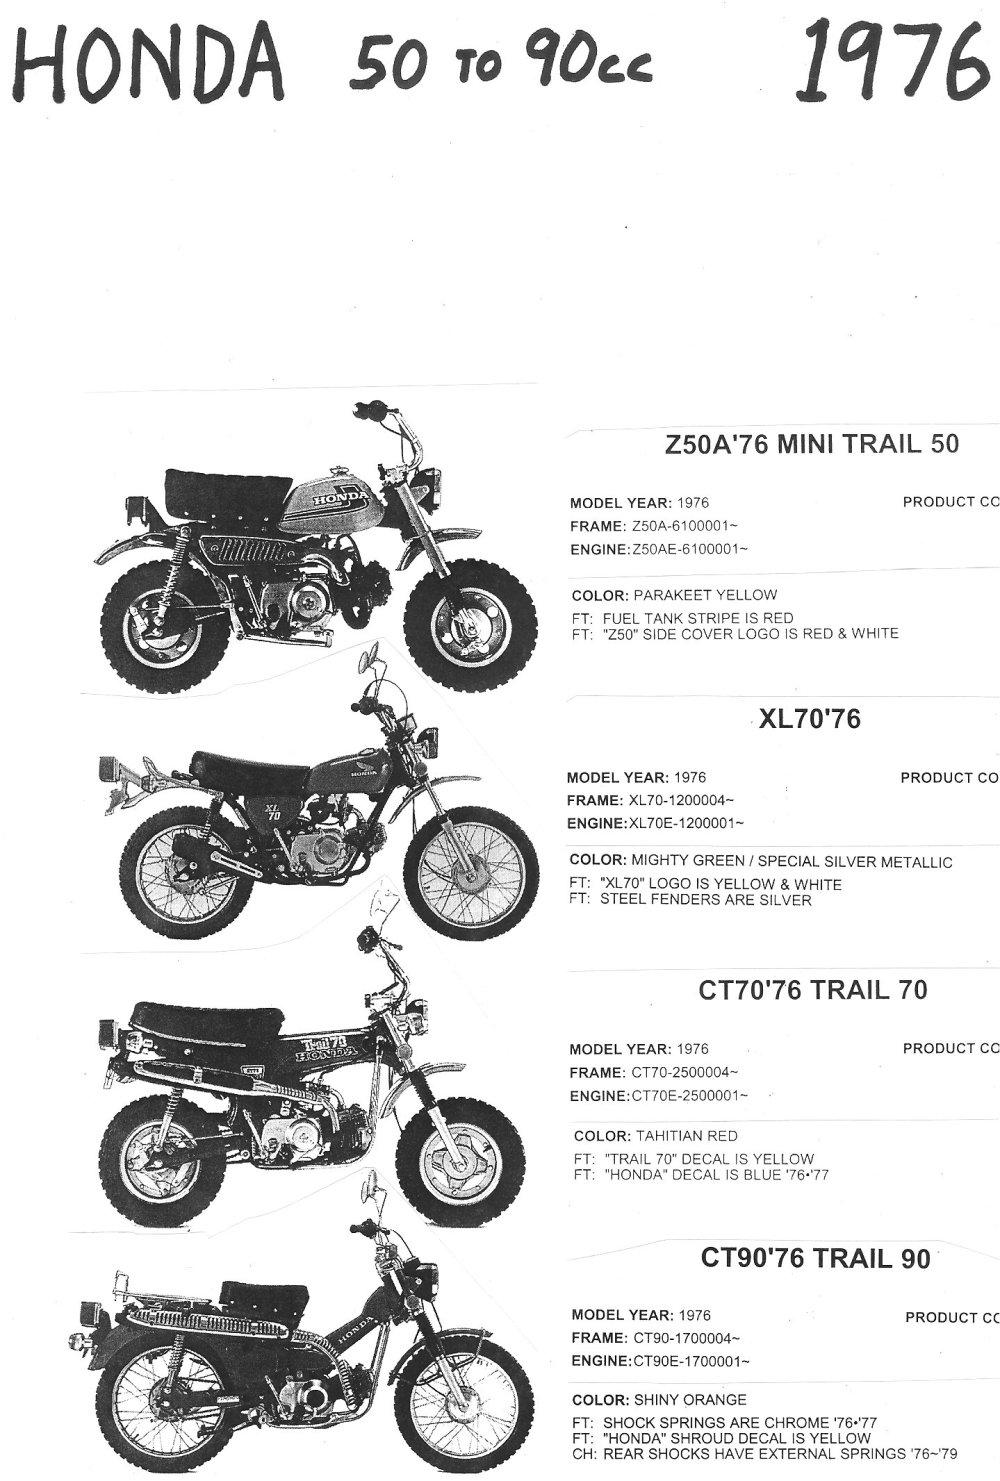 medium resolution of honda ct 70 k3 clutch assembly diagram wiring diagram furthermore 1974 honda ct70 trail 70 on honda ct 70 engine diagram